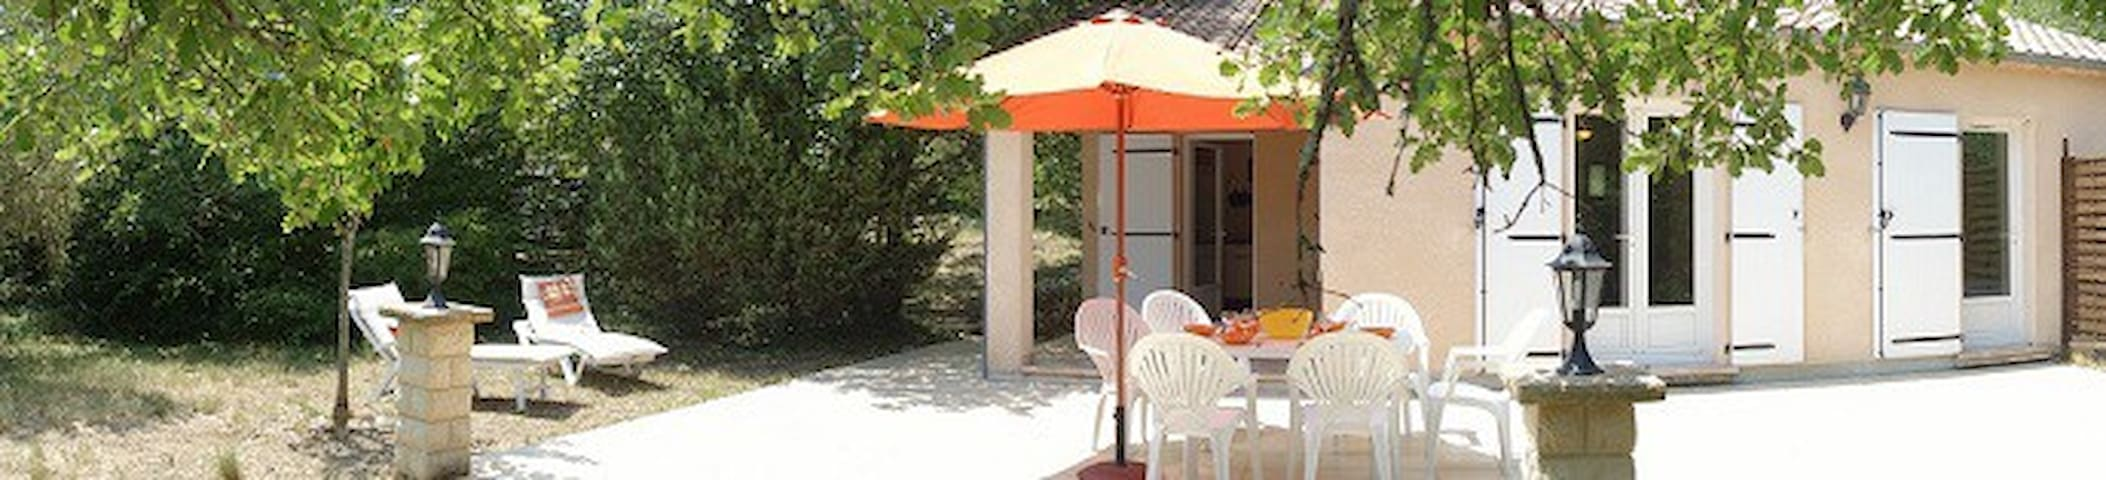 Villa 4 personnes climatisée - Ruoms - 단독주택